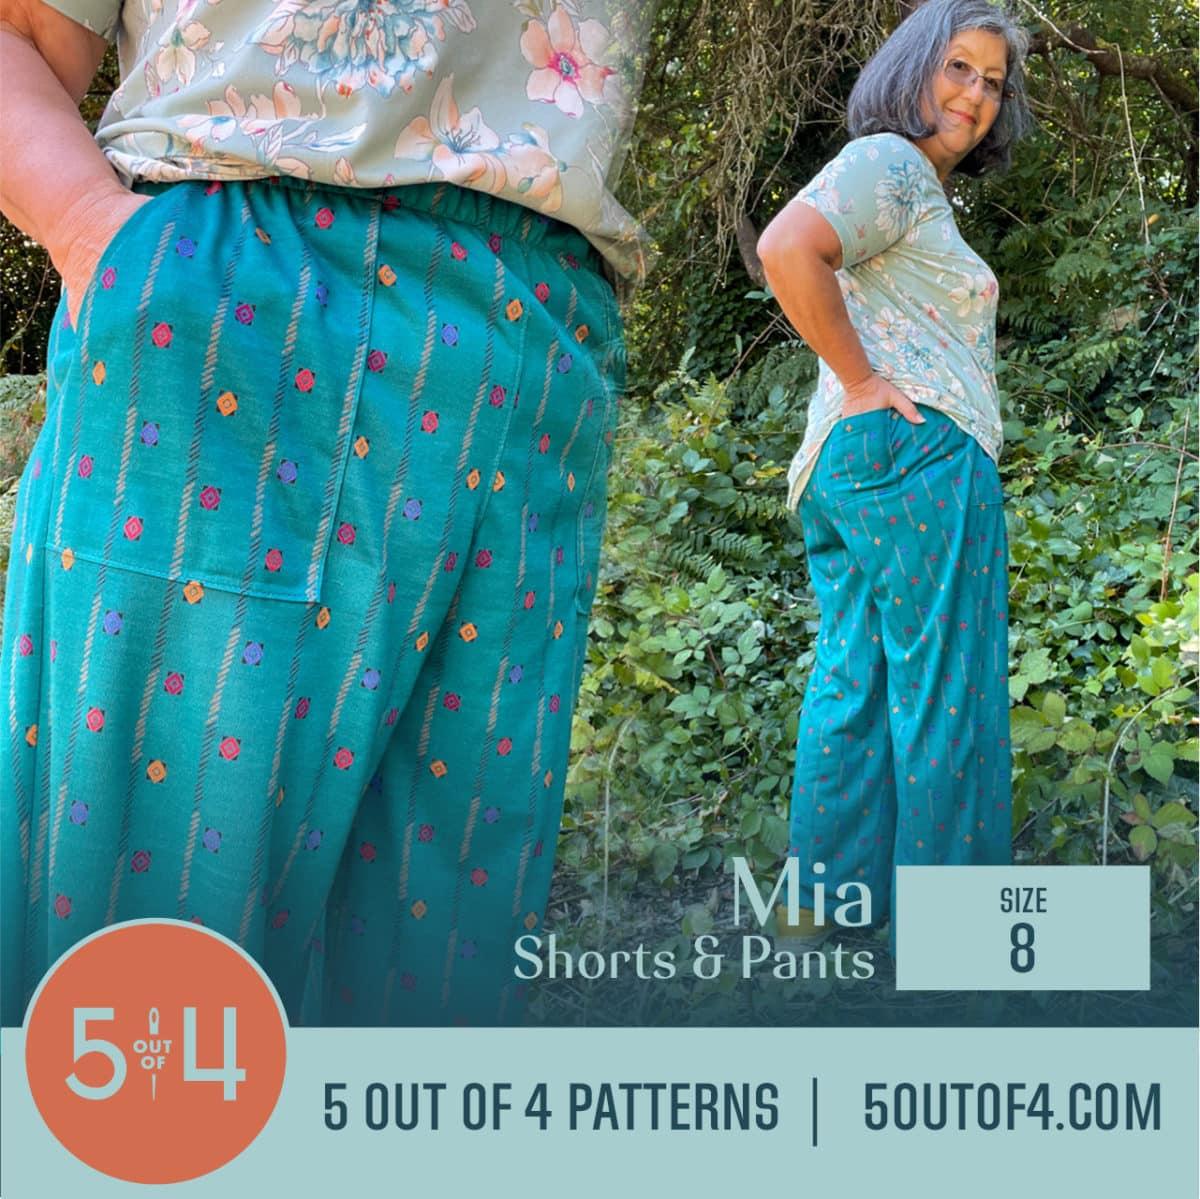 5oo4 Patterns Mia Pants size 8